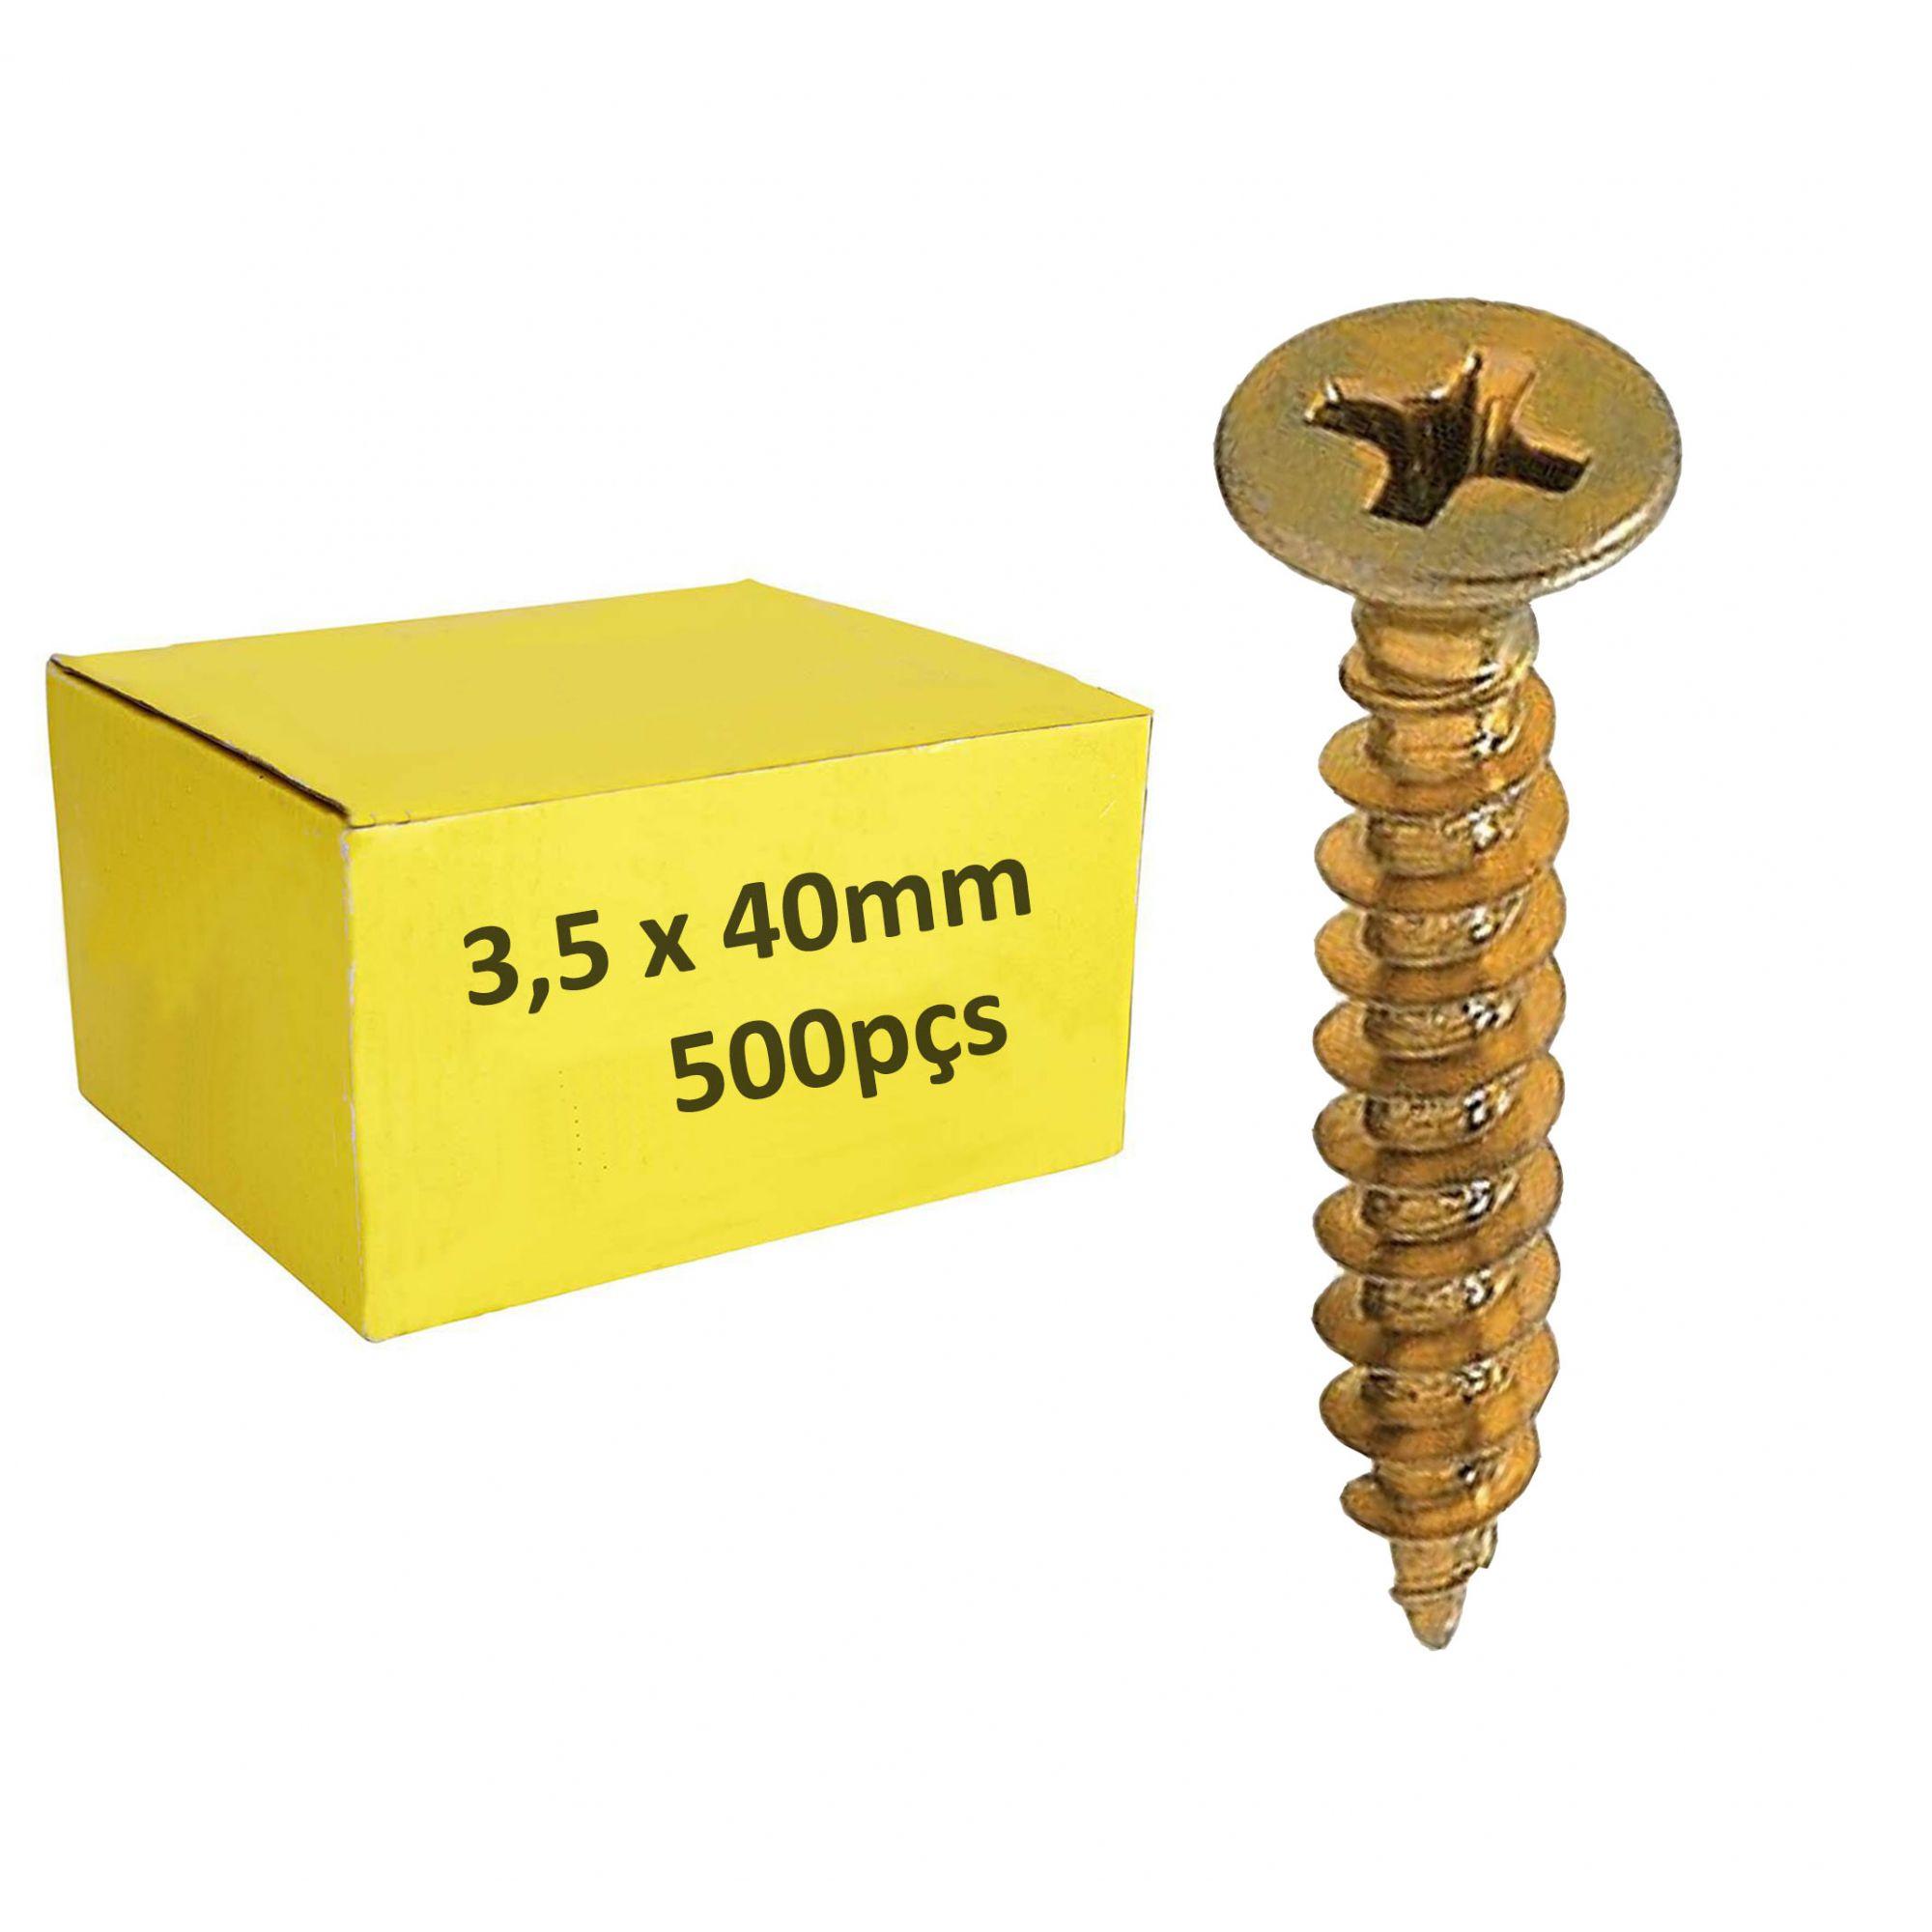 Parafuso 3,5mm x 40mm ChipBoard bicromatizado Cx c/ 500pçs